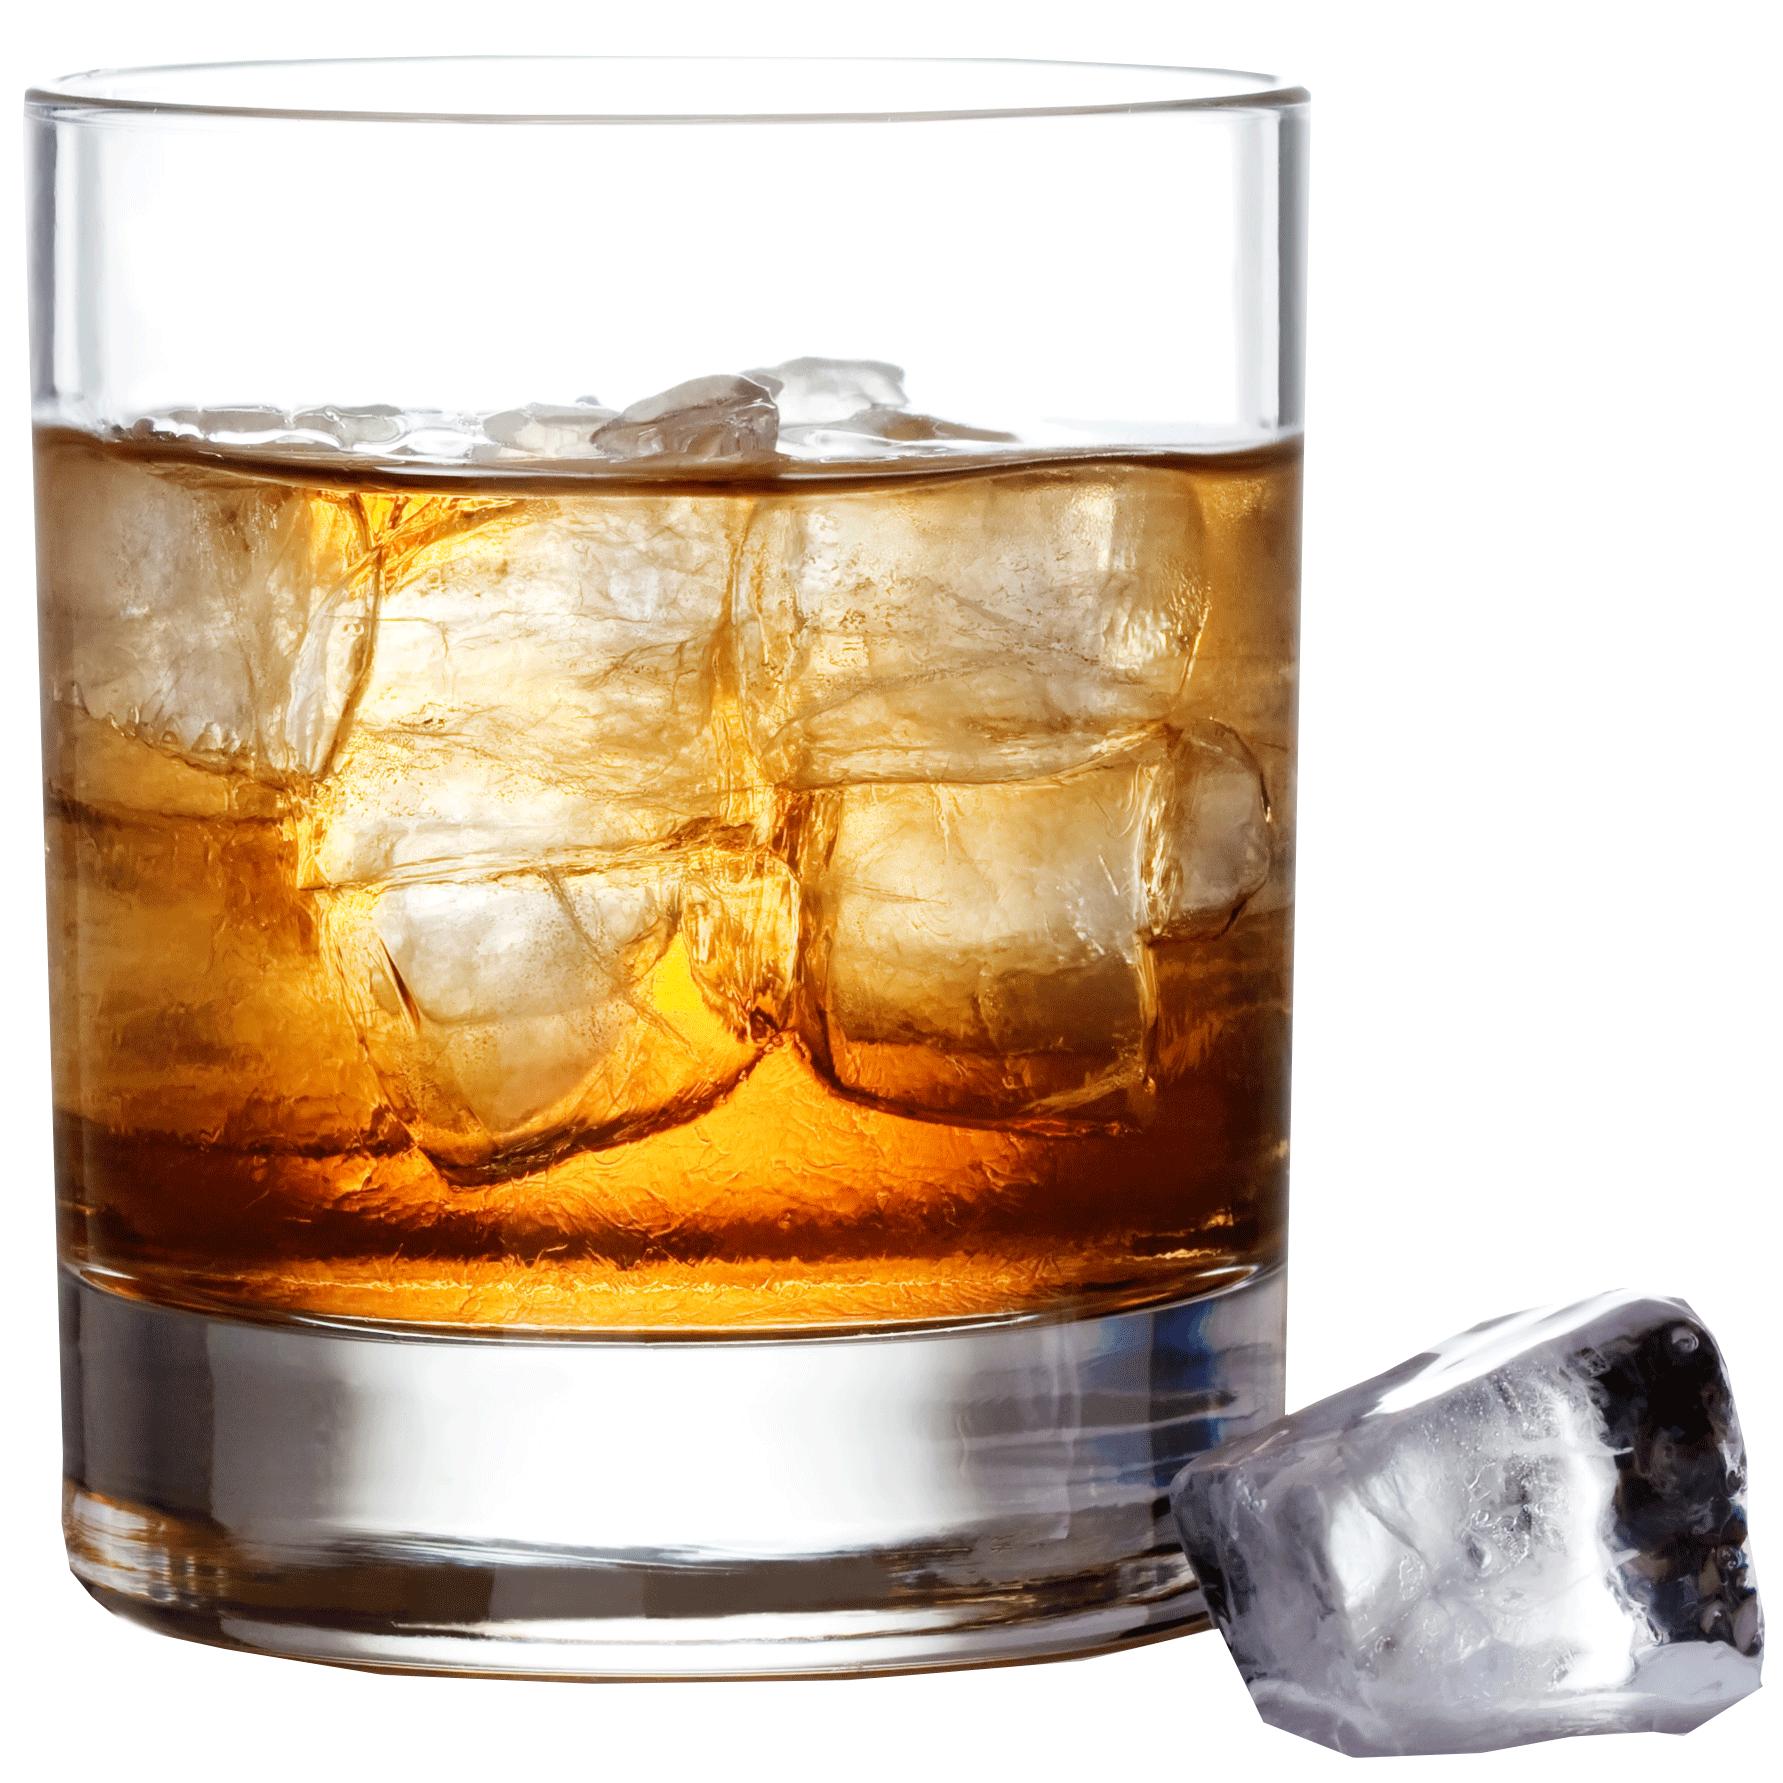 irish-whiskey-jameson-scotch-bourbon-1